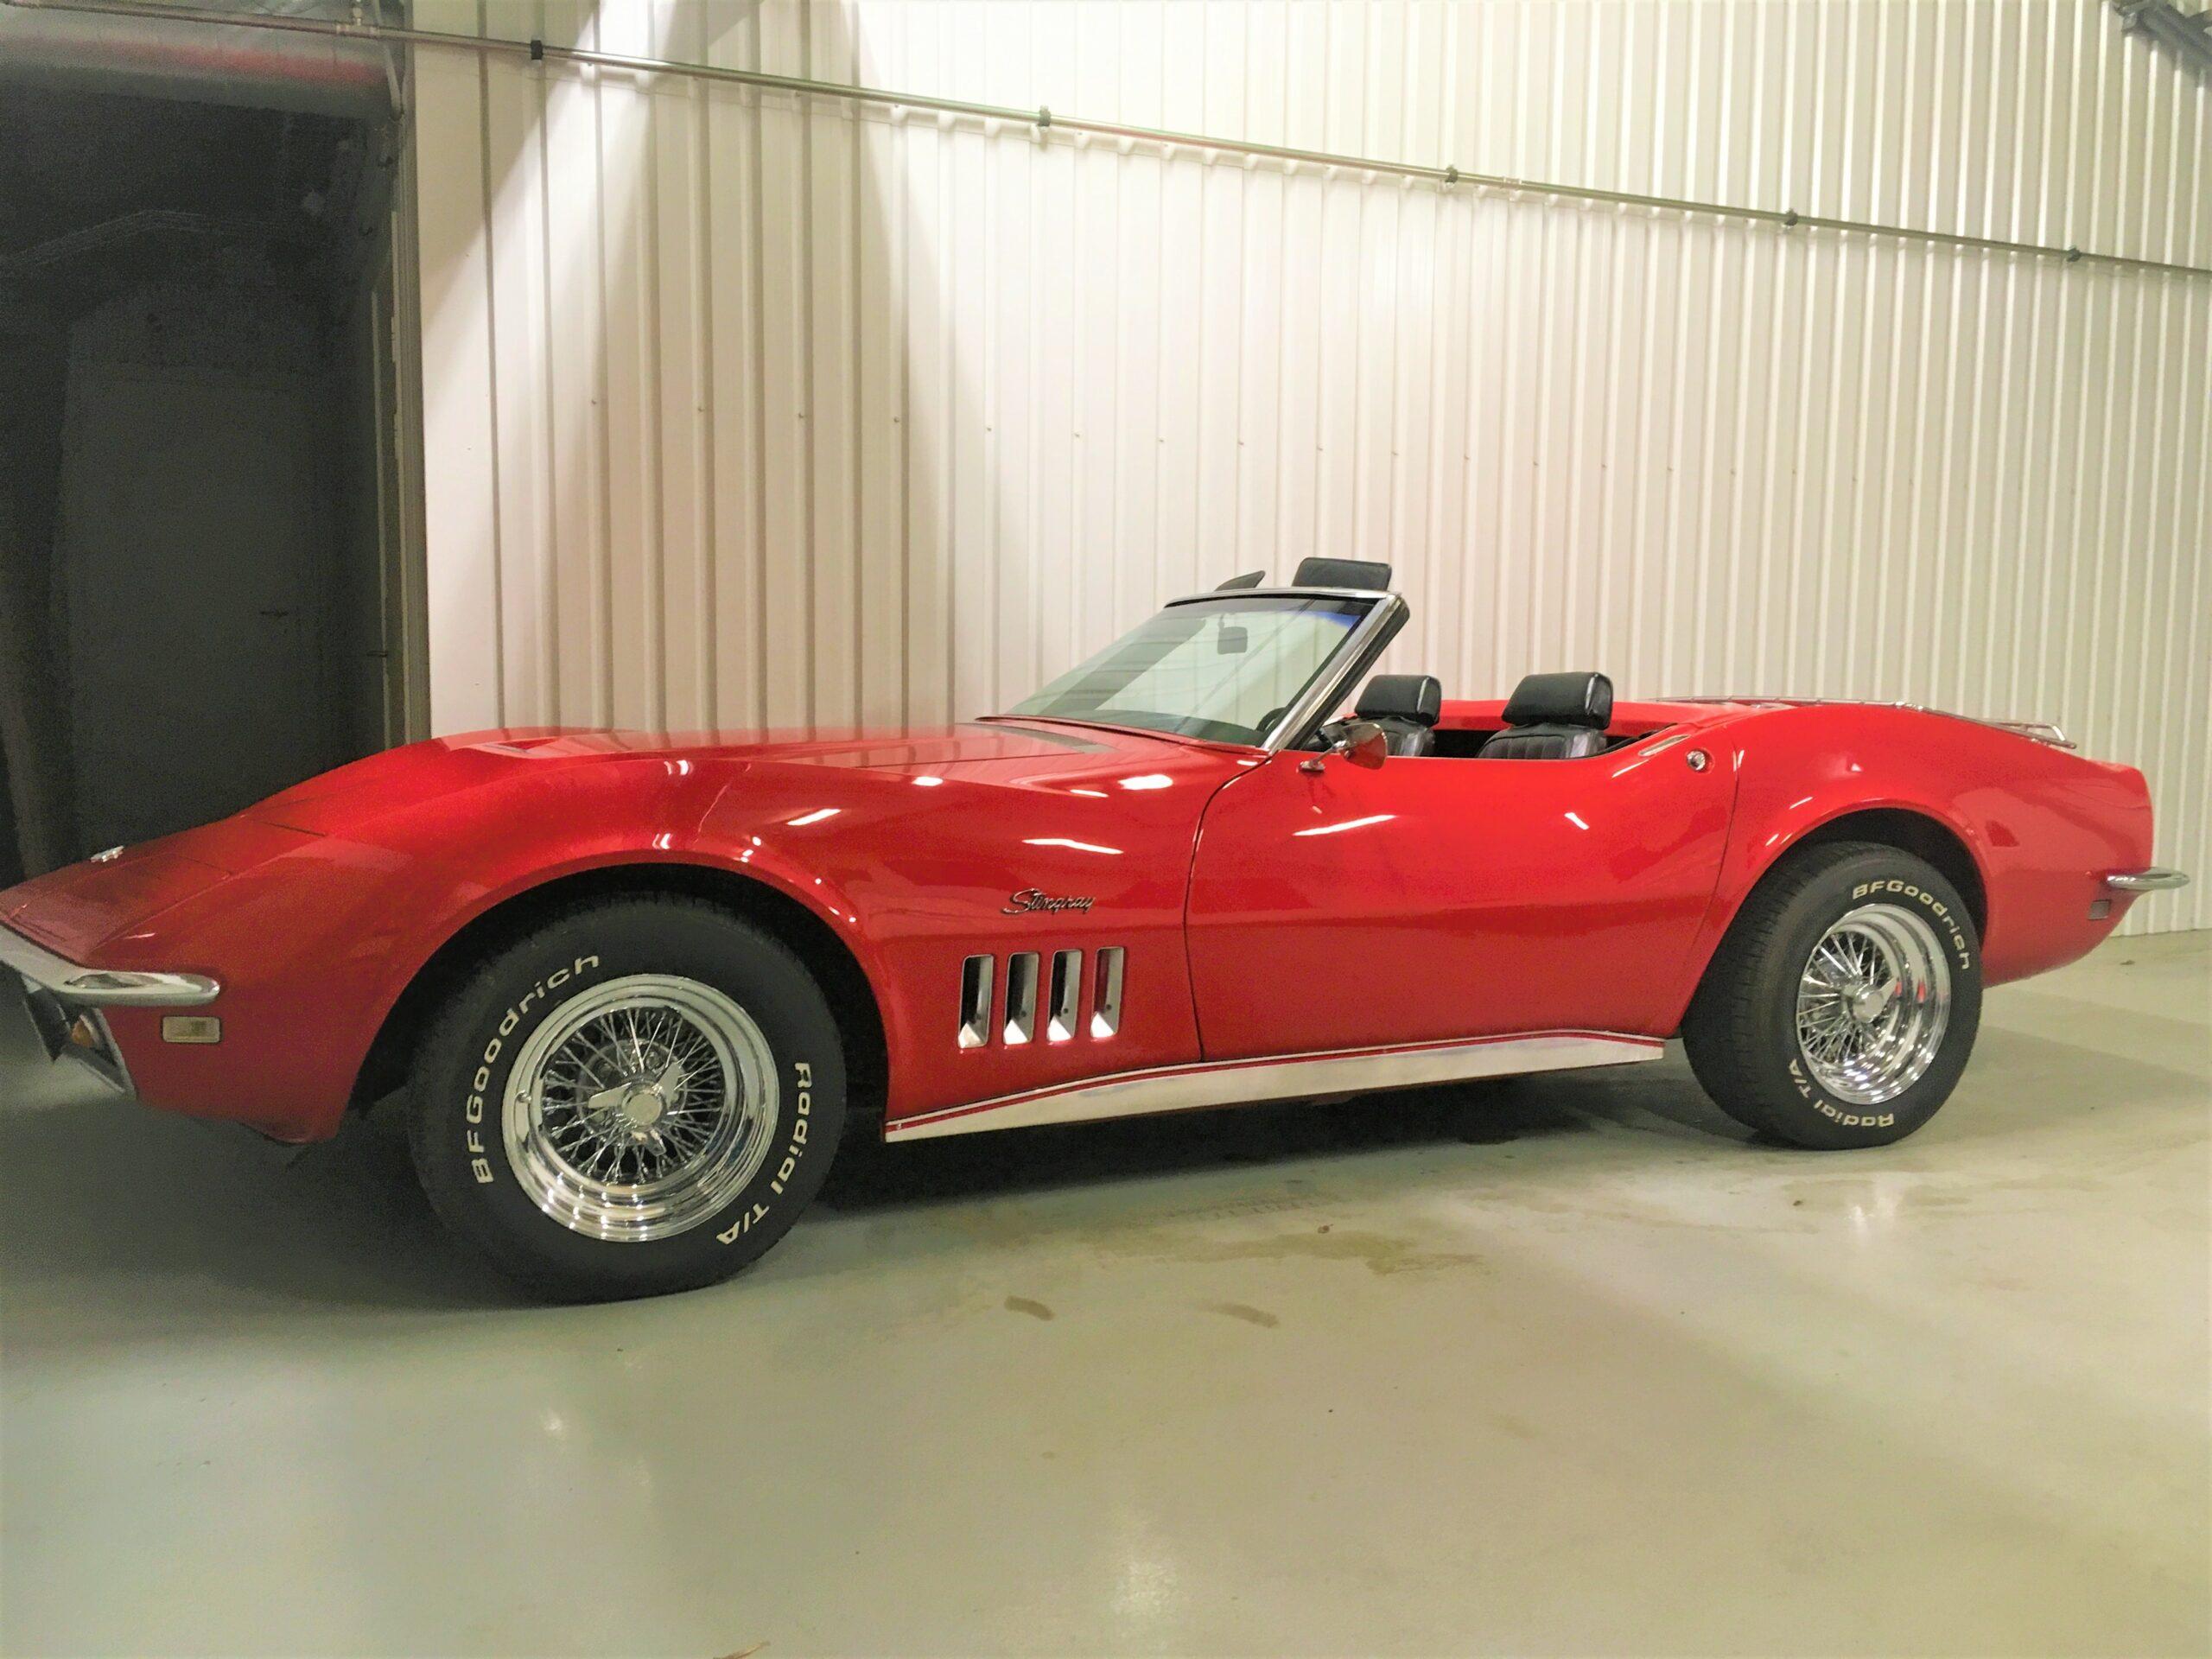 1968 Chevrolet Corvette cab